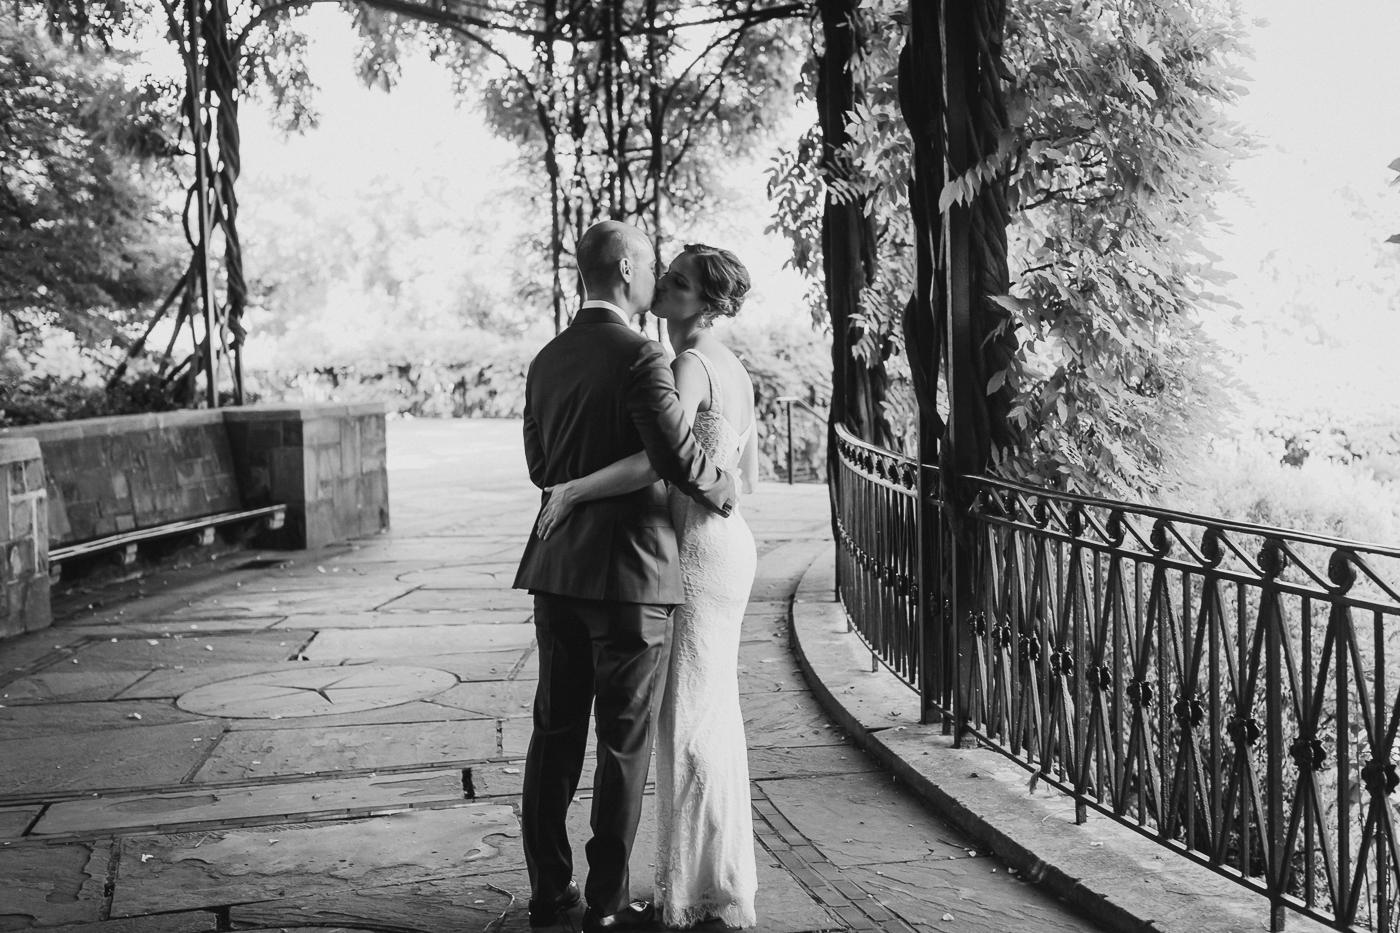 NYC-Central-Park-Conservatory-Garden-Intimate-Elopement-Documentary-Wedding-Photographer-28.jpg